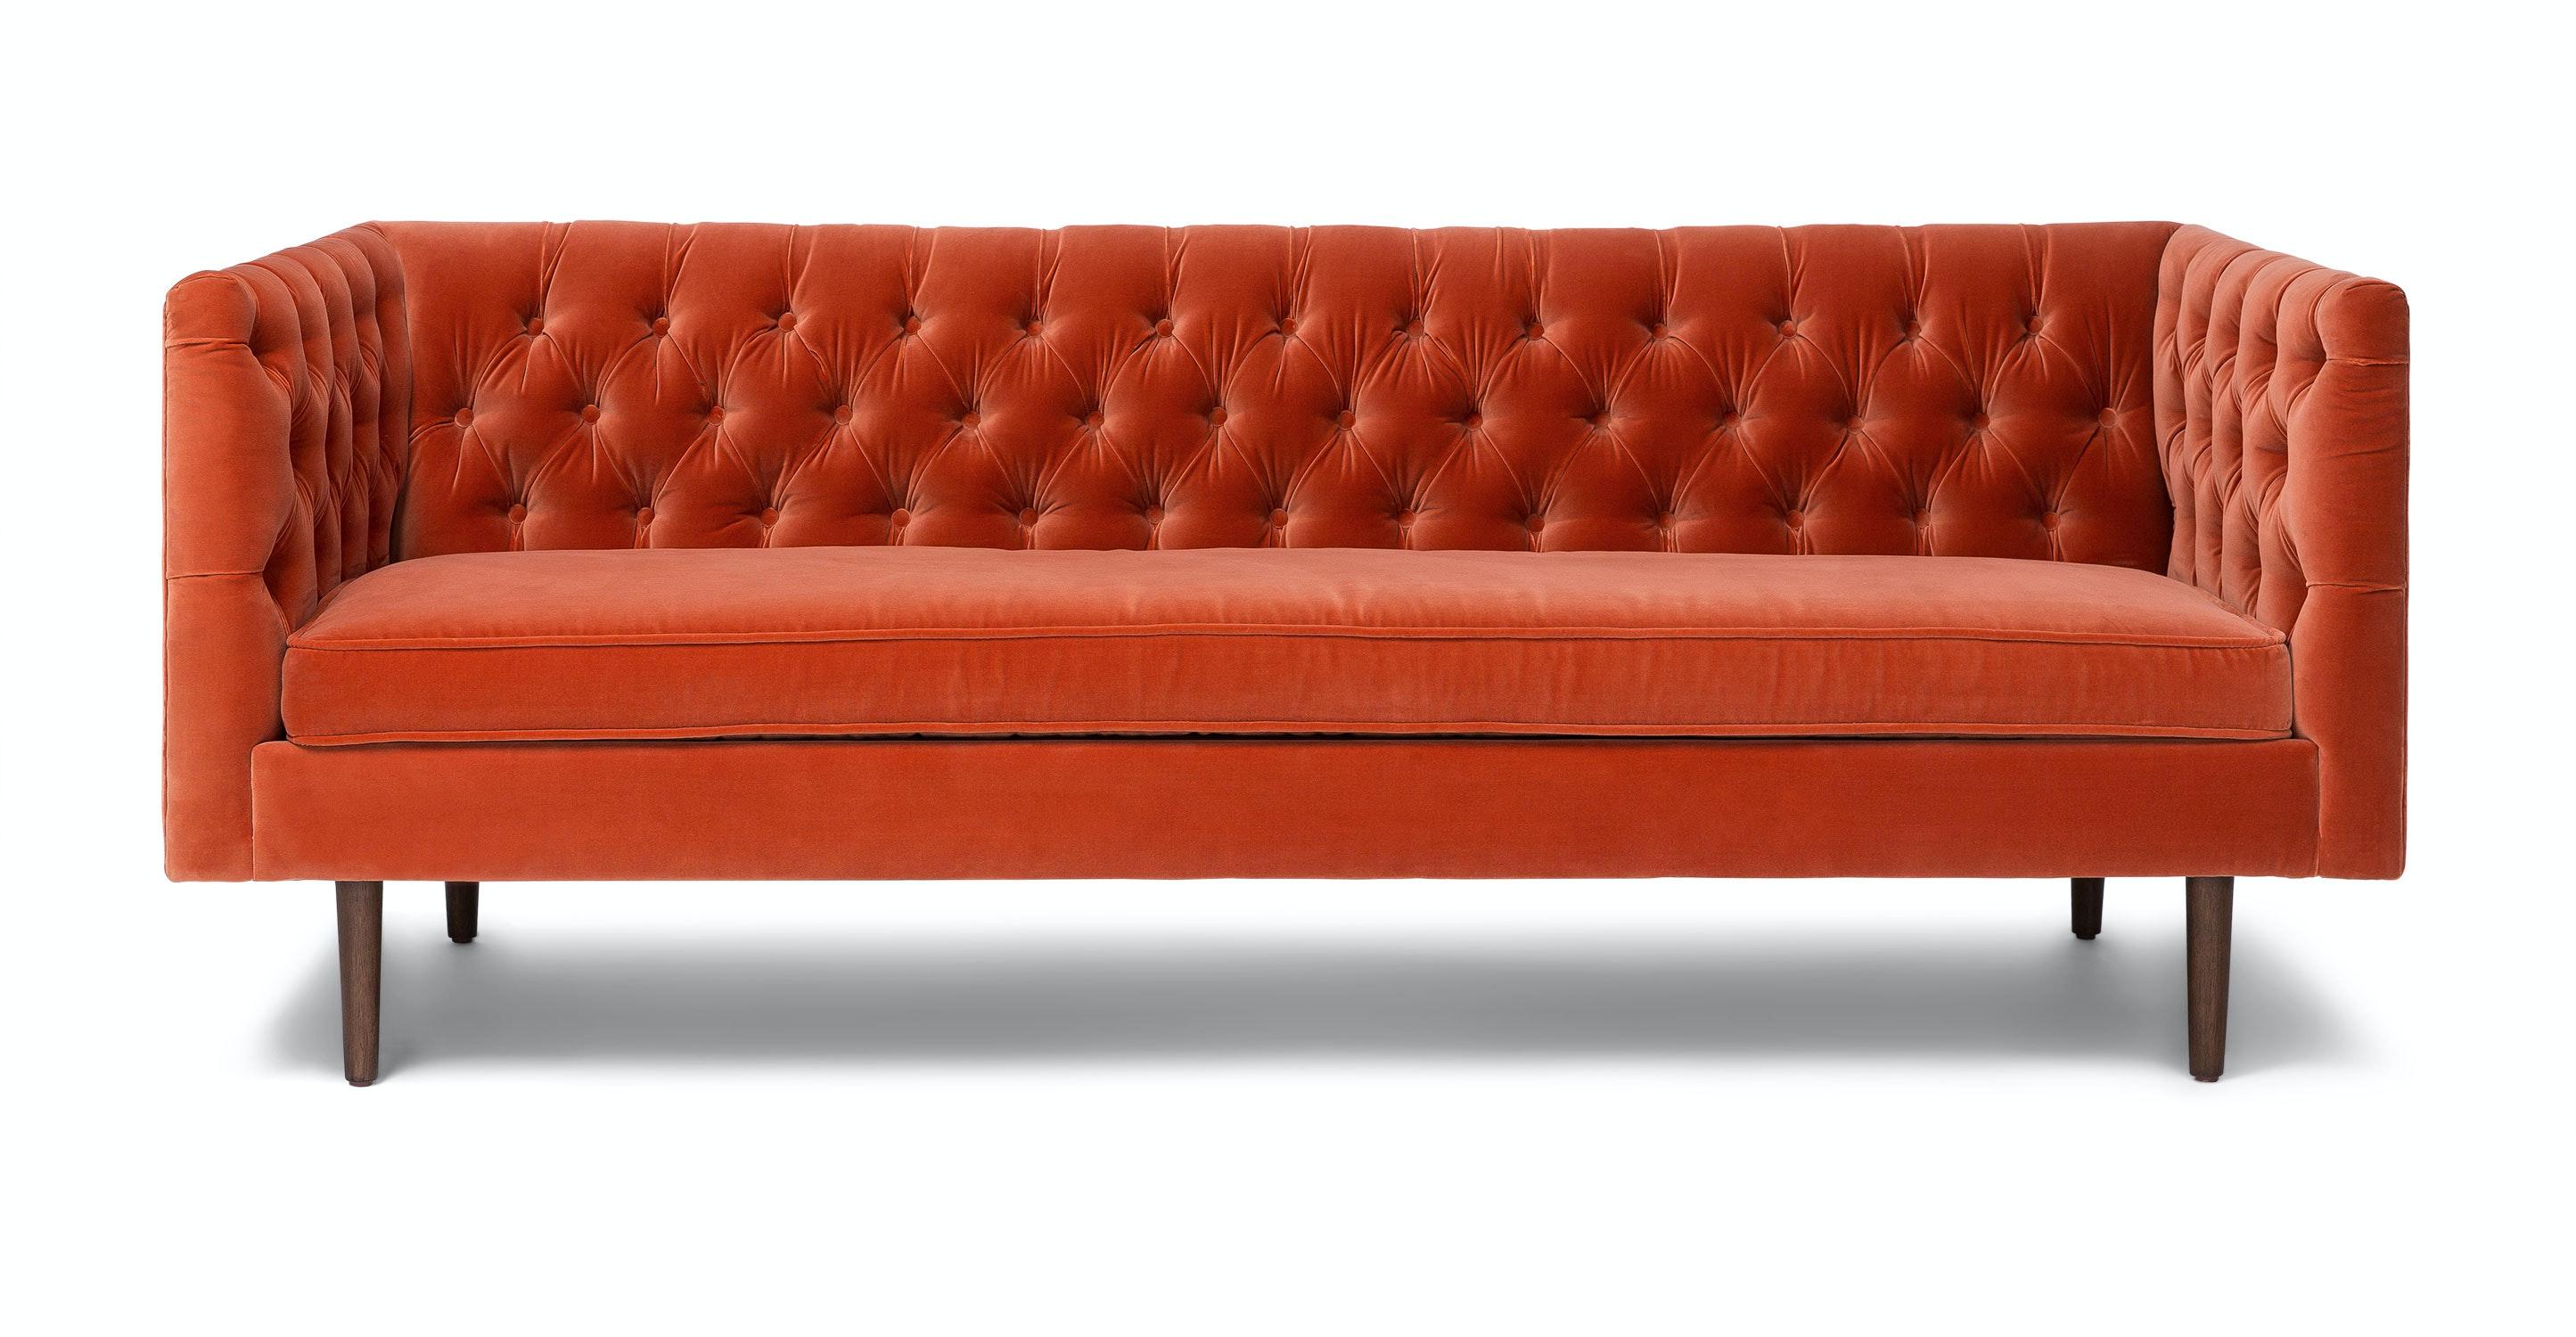 chester persimmon orange sofa sofas article modern mid rh article com orange leather sofa set leather sofa orange county